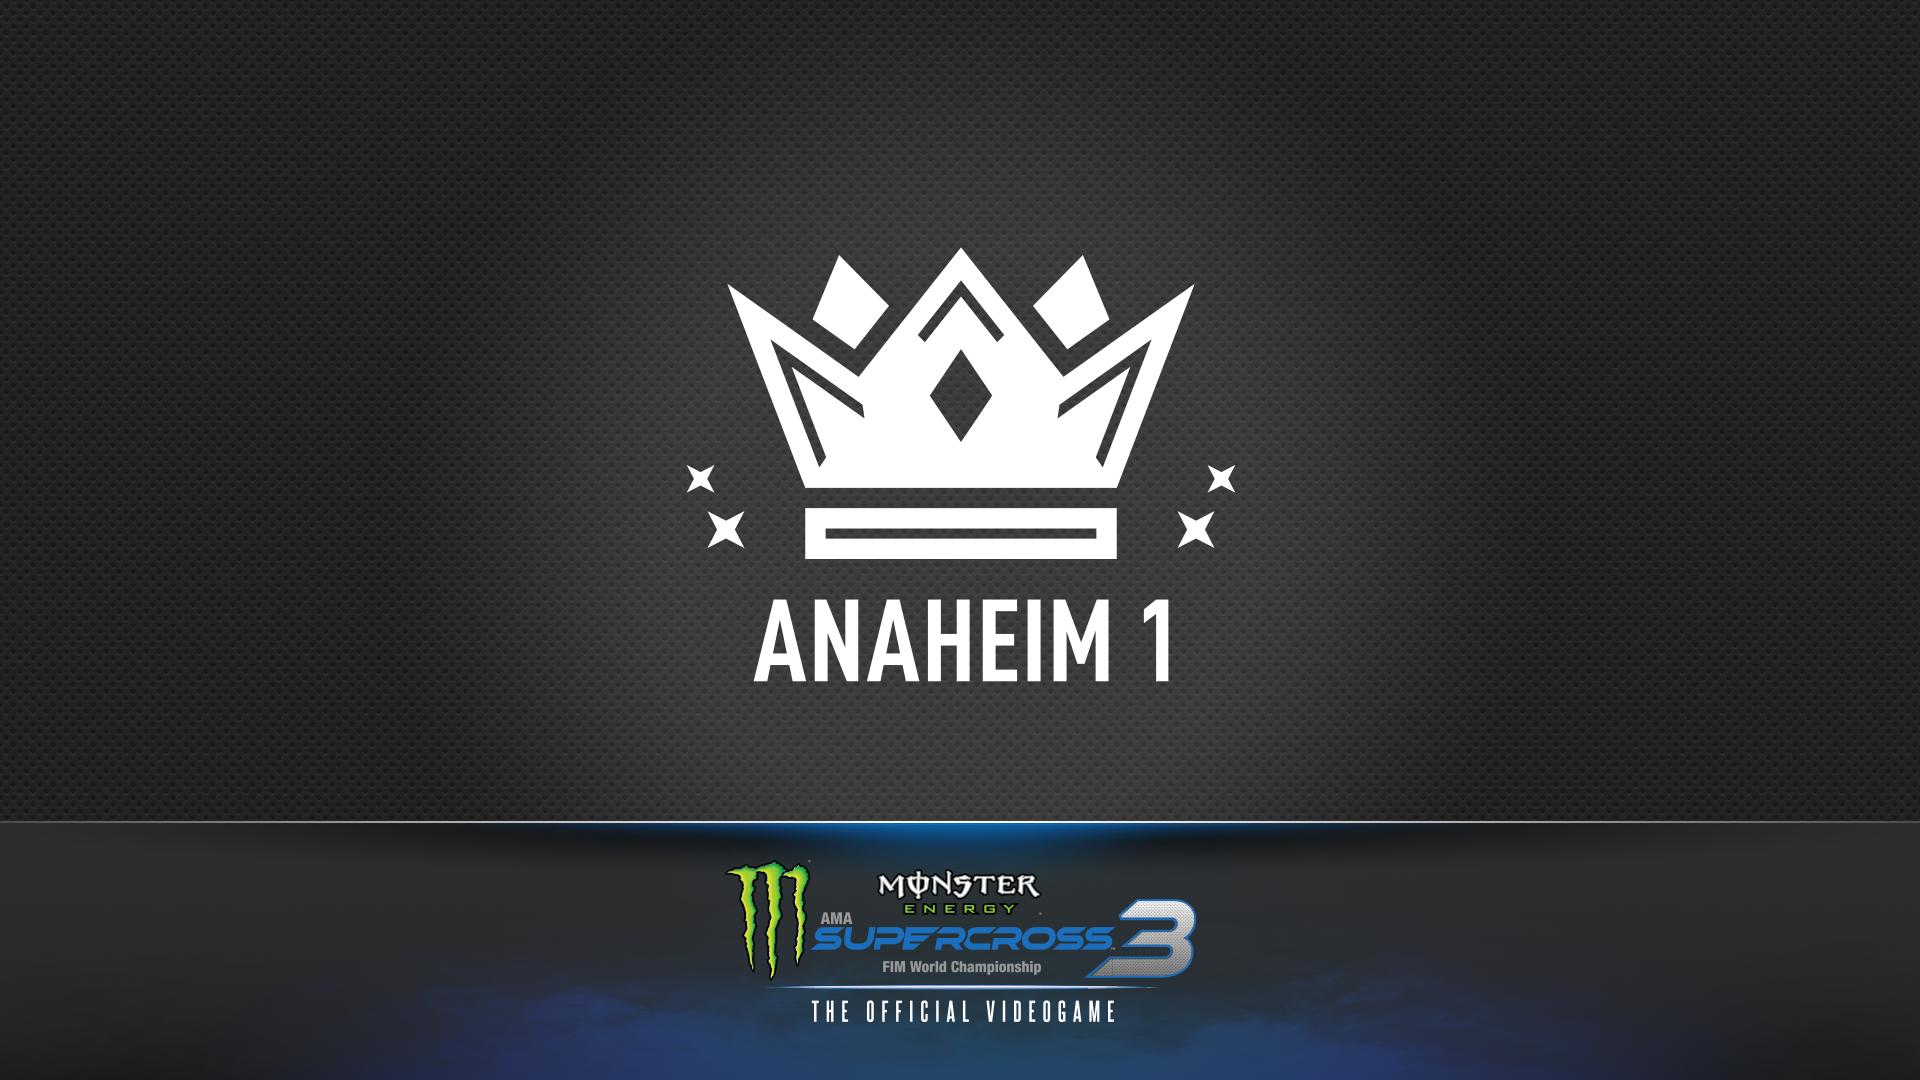 King of Anaheim 1